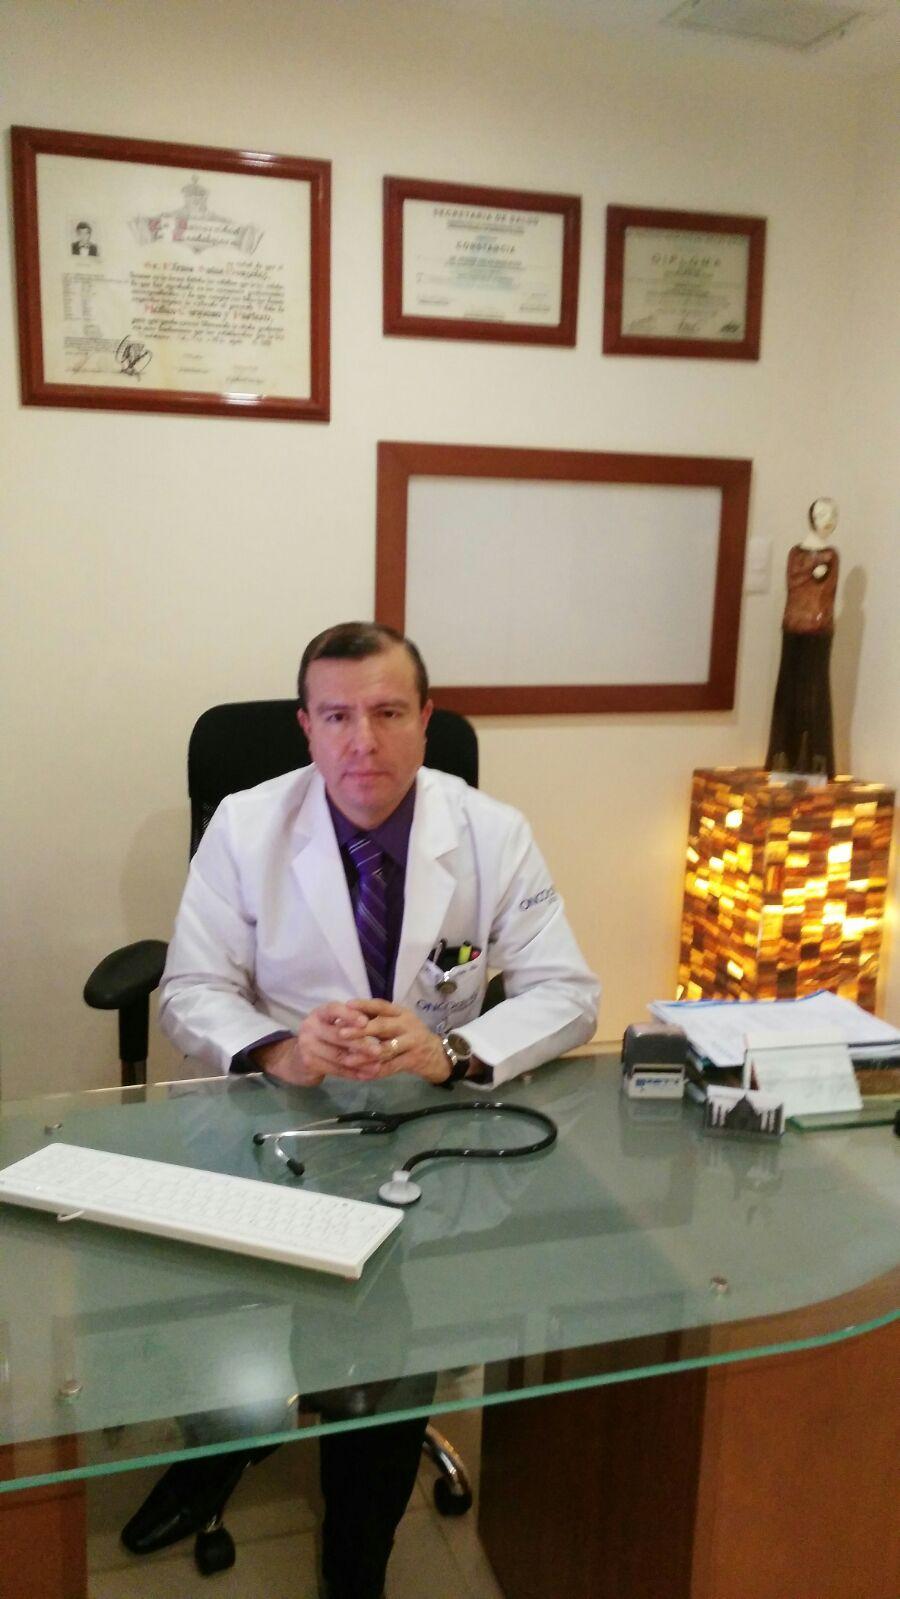 Dr. Efraín Salas González